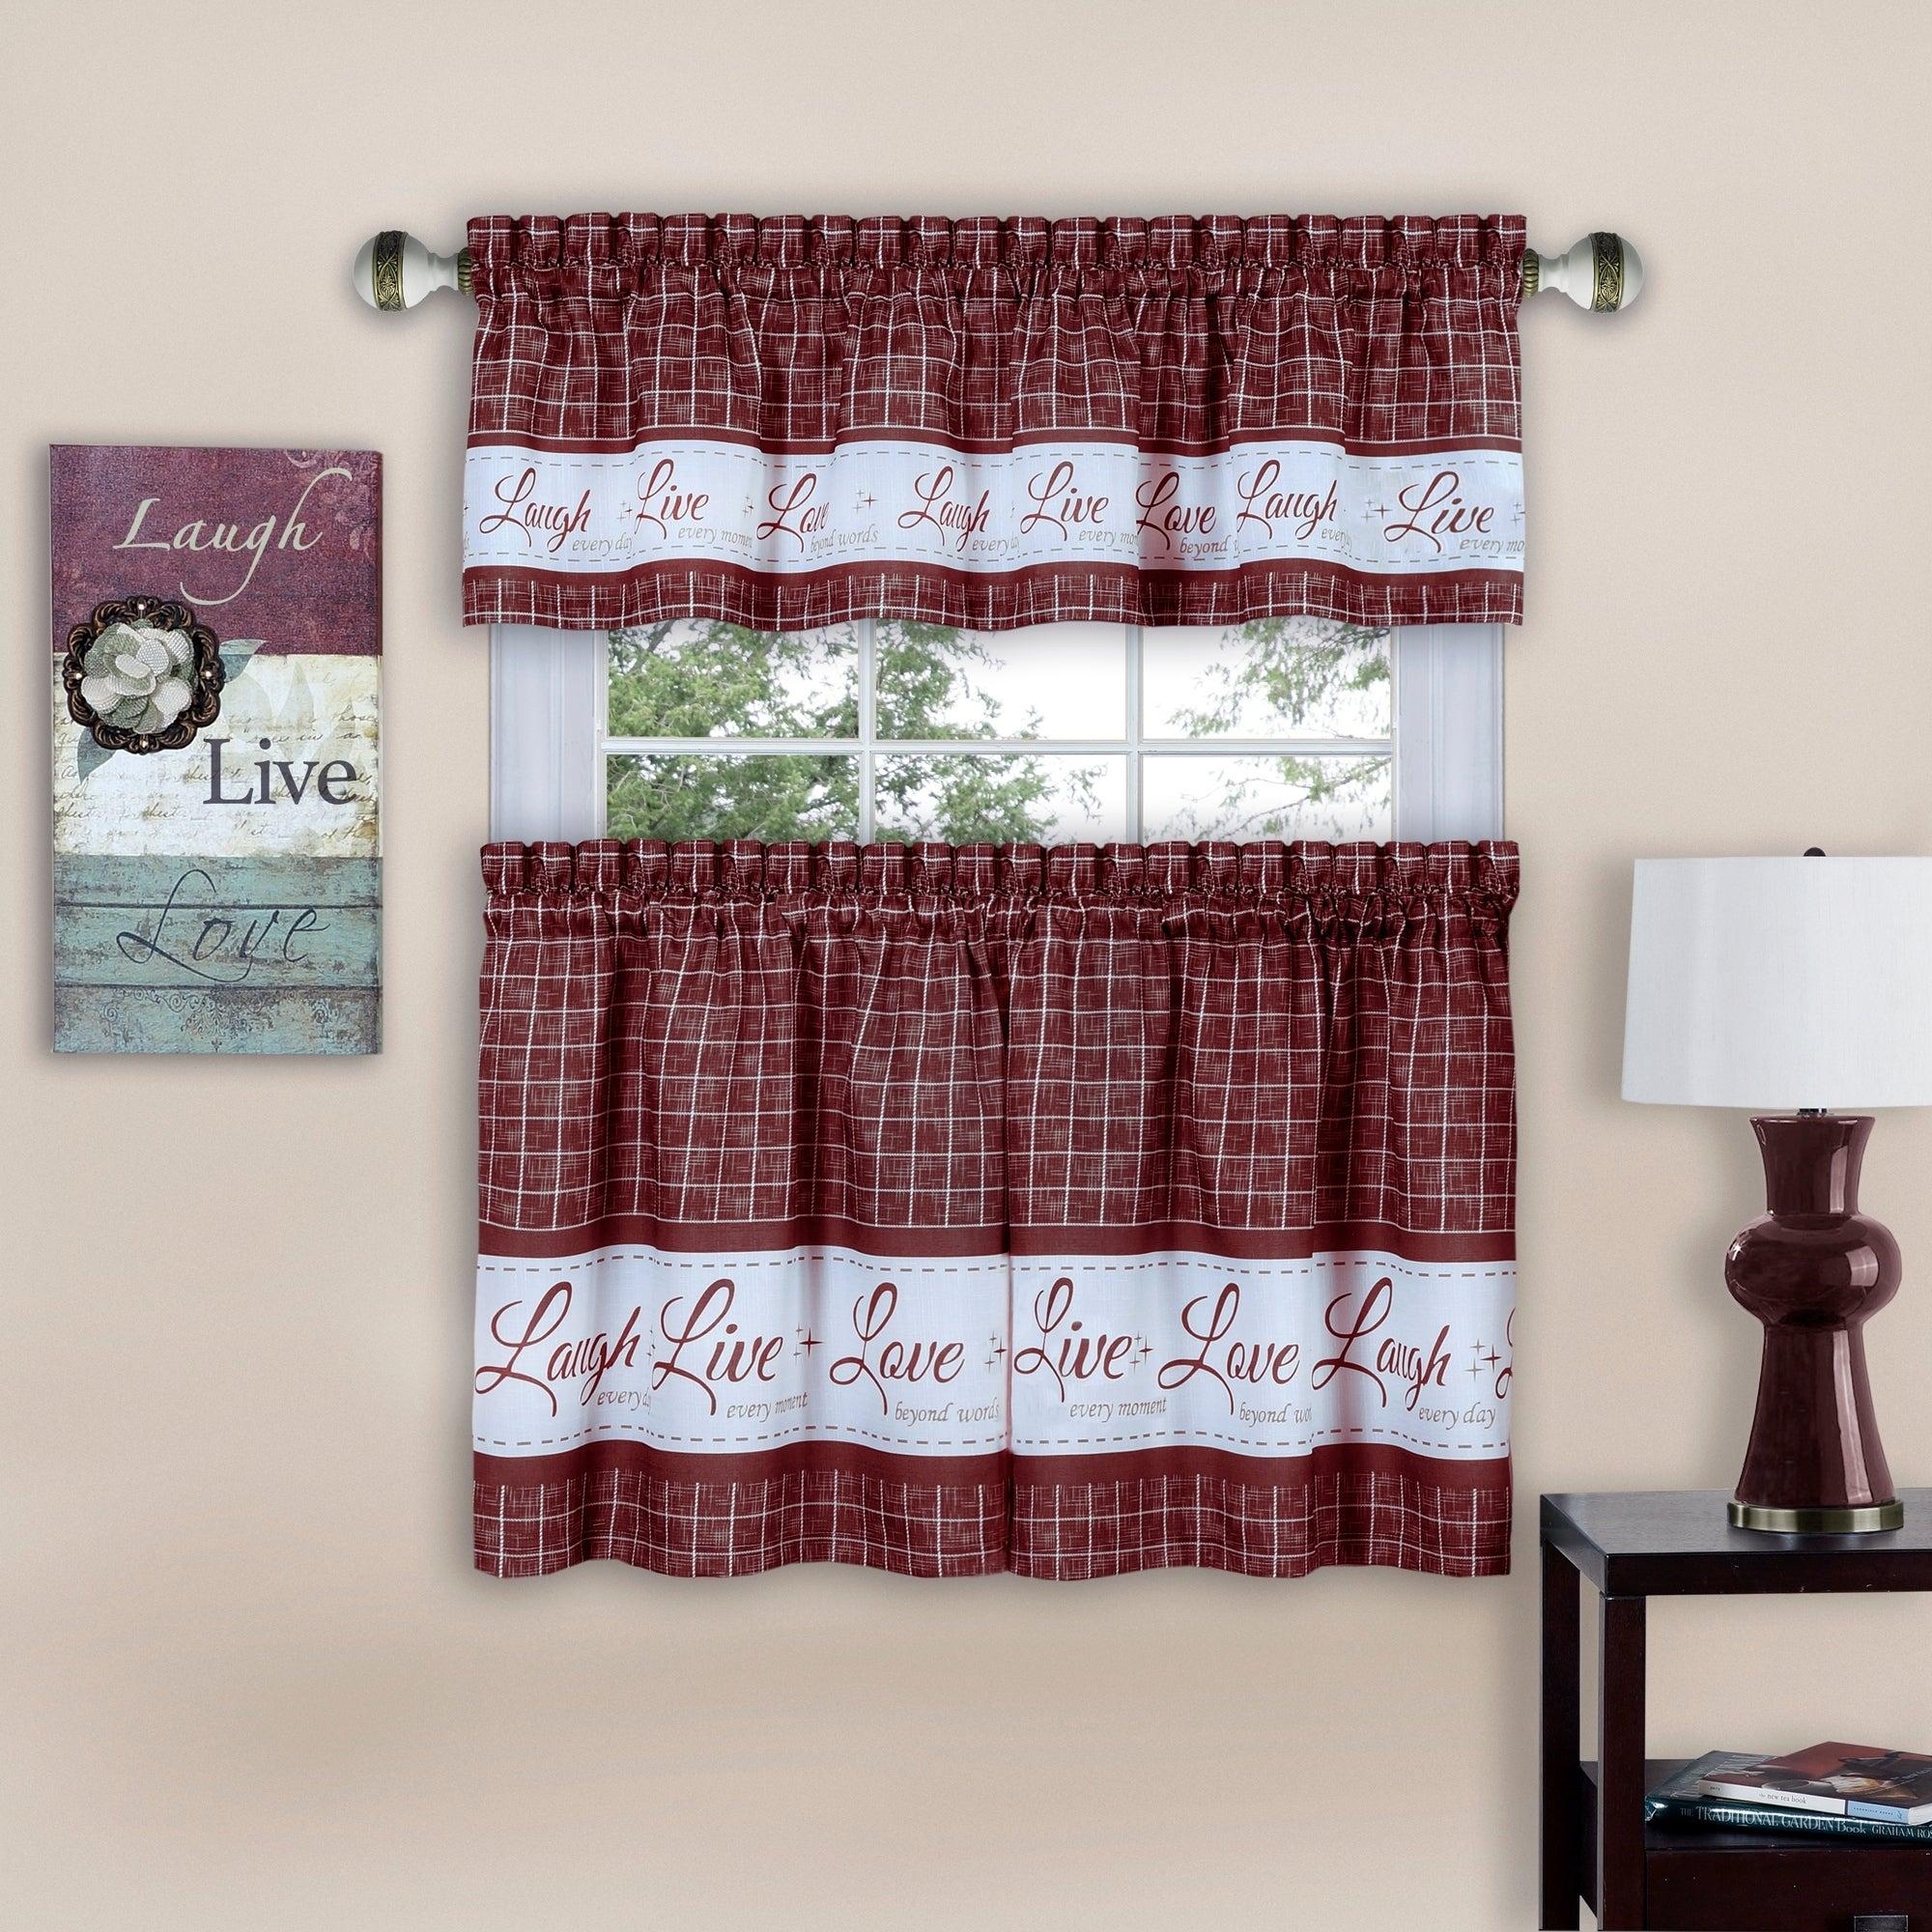 Live, Love, Laugh Window Curtain Tier Pair And Valance Set Pertaining To Dakota Window Curtain Tier Pair And Valance Sets (View 8 of 20)